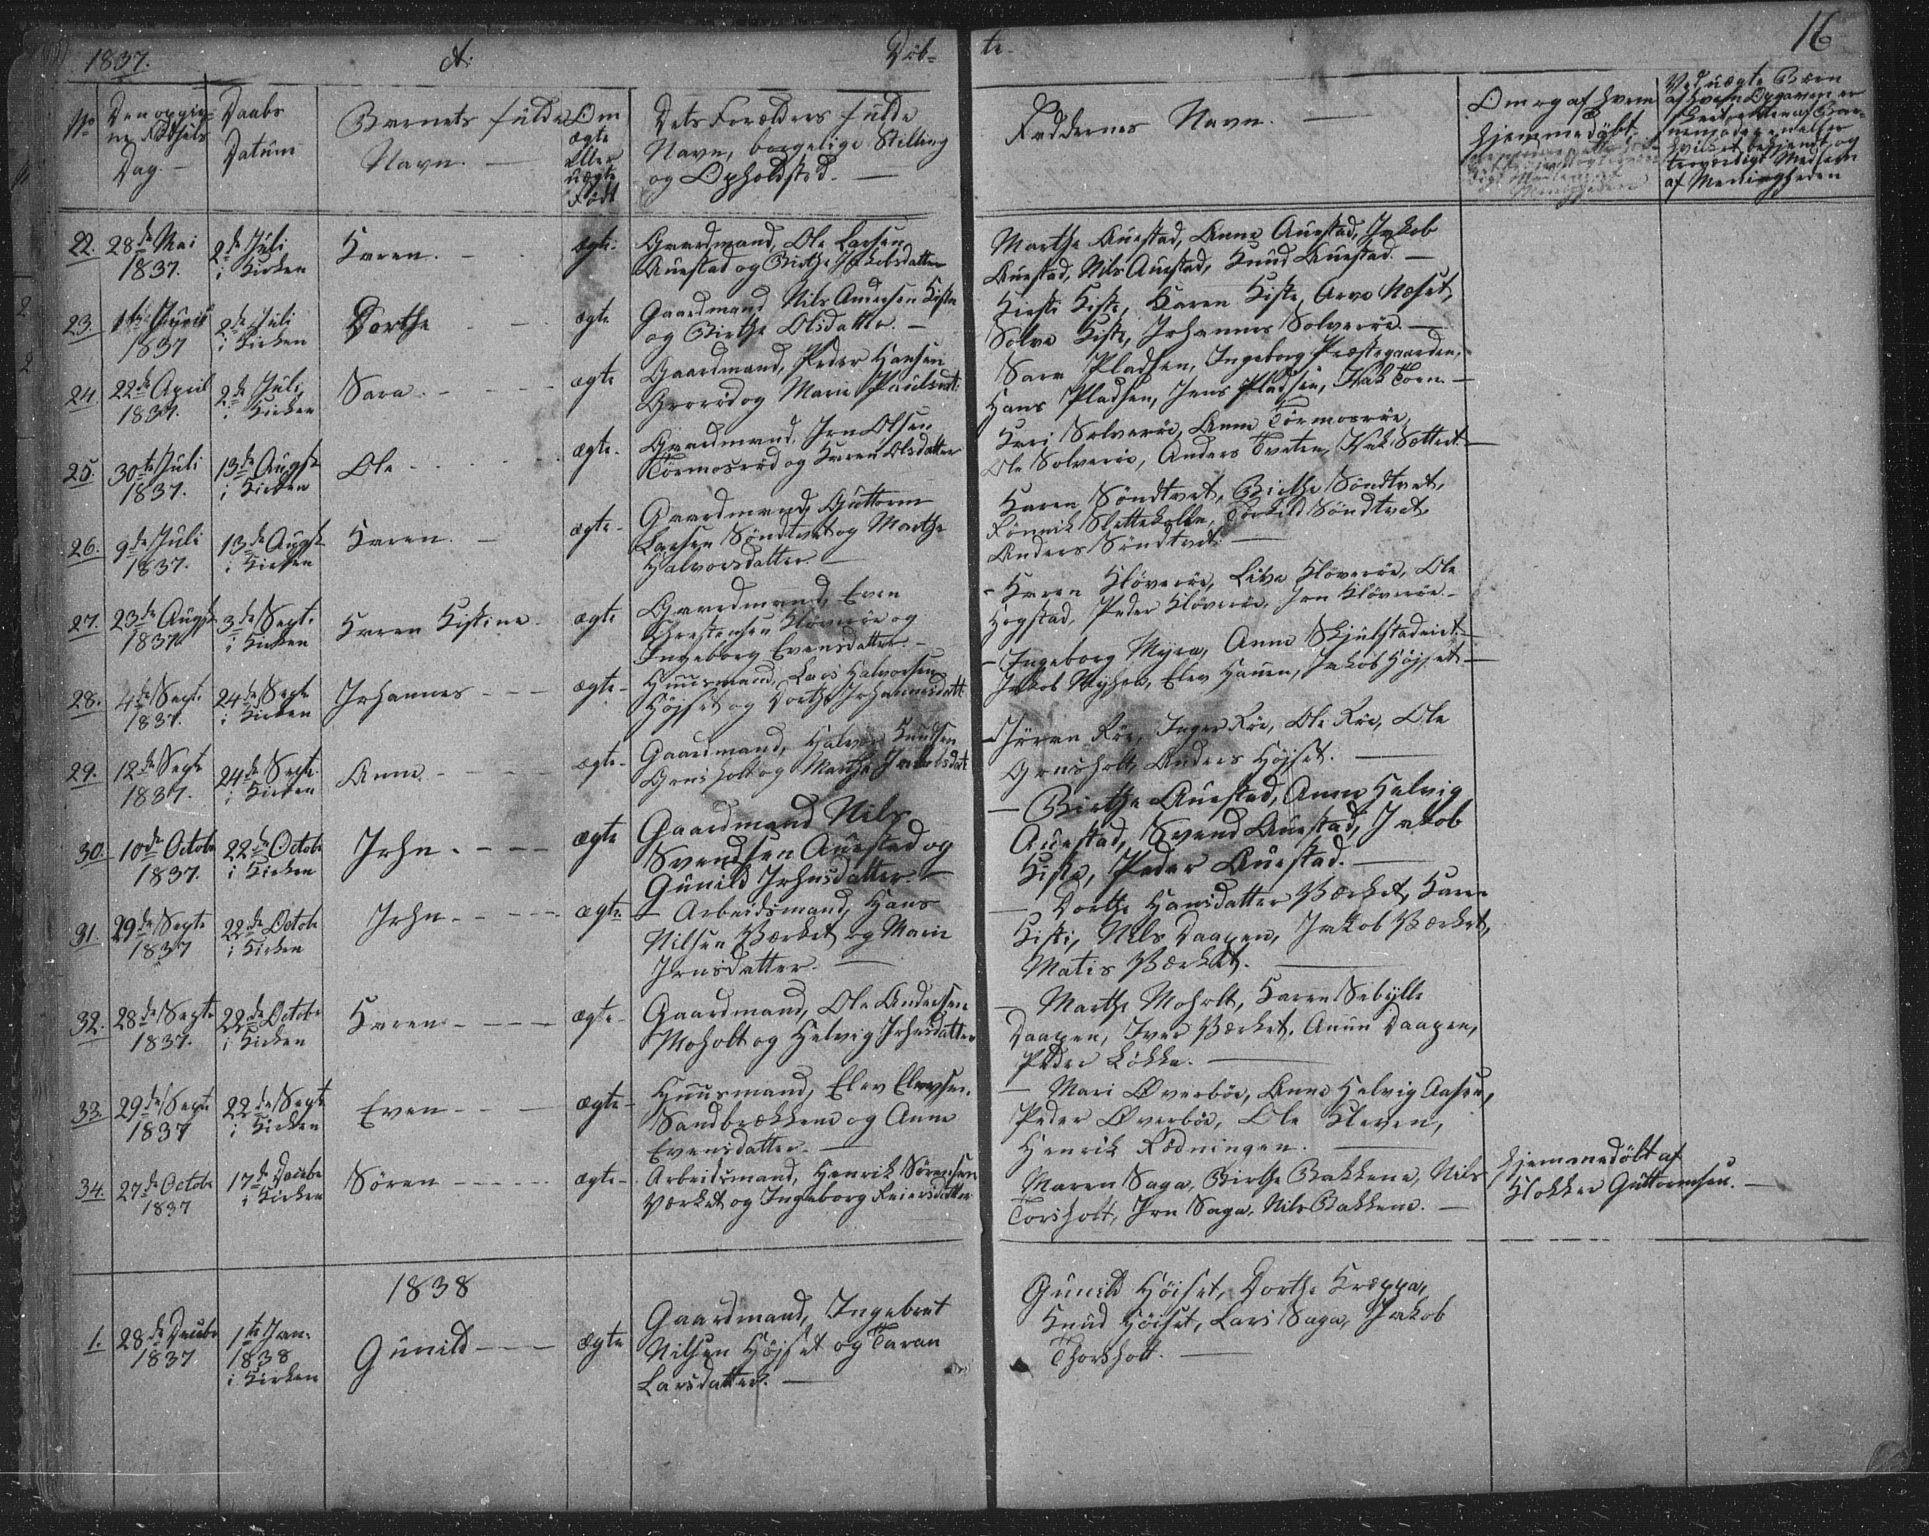 SAKO, Siljan kirkebøker, F/Fa/L0001: Parish register (official) no. 1, 1831-1870, p. 16